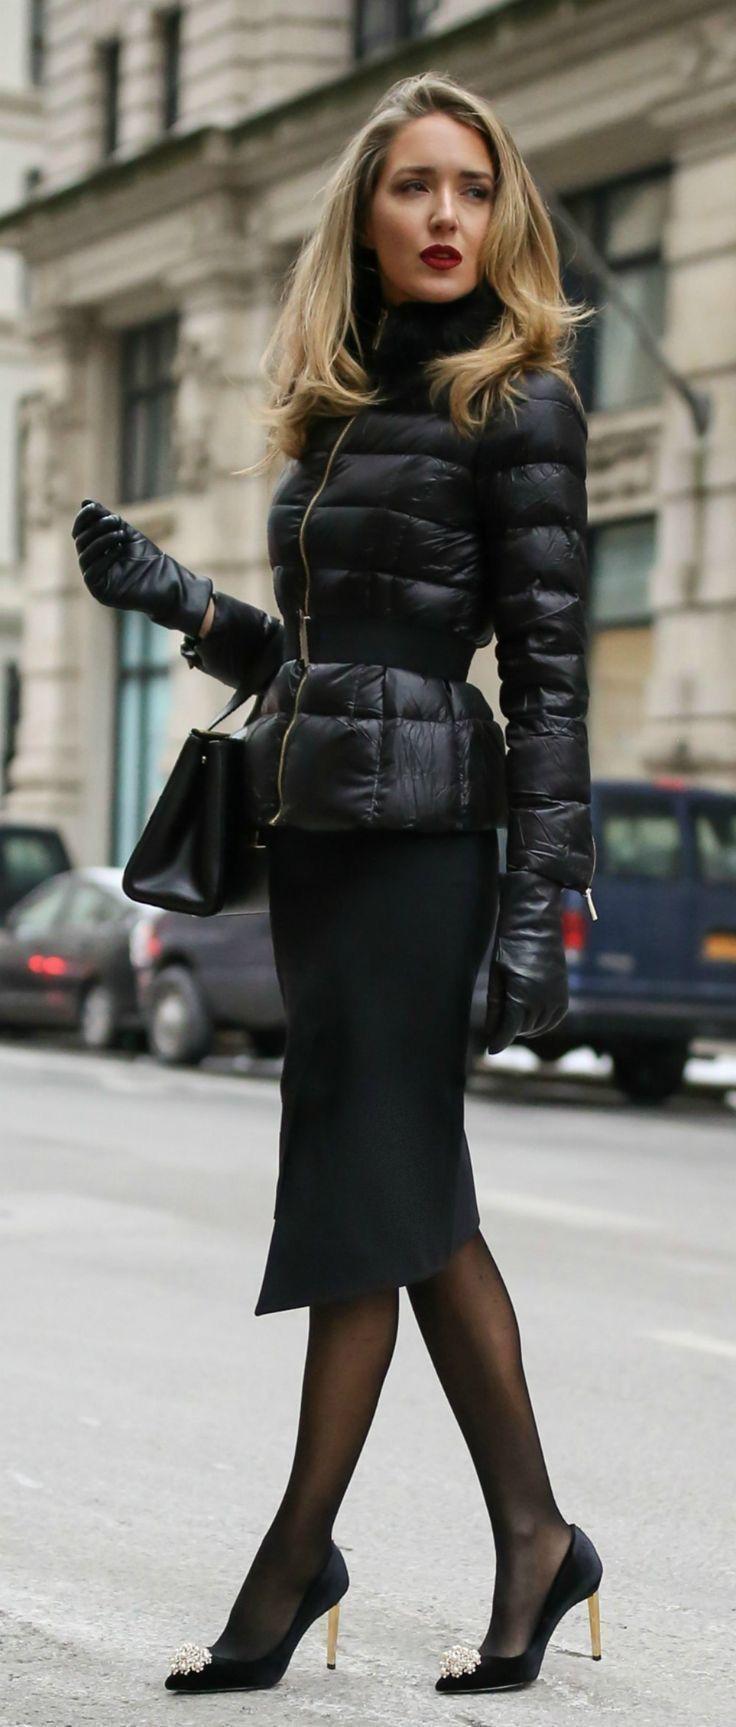 Black chic leather looks photos